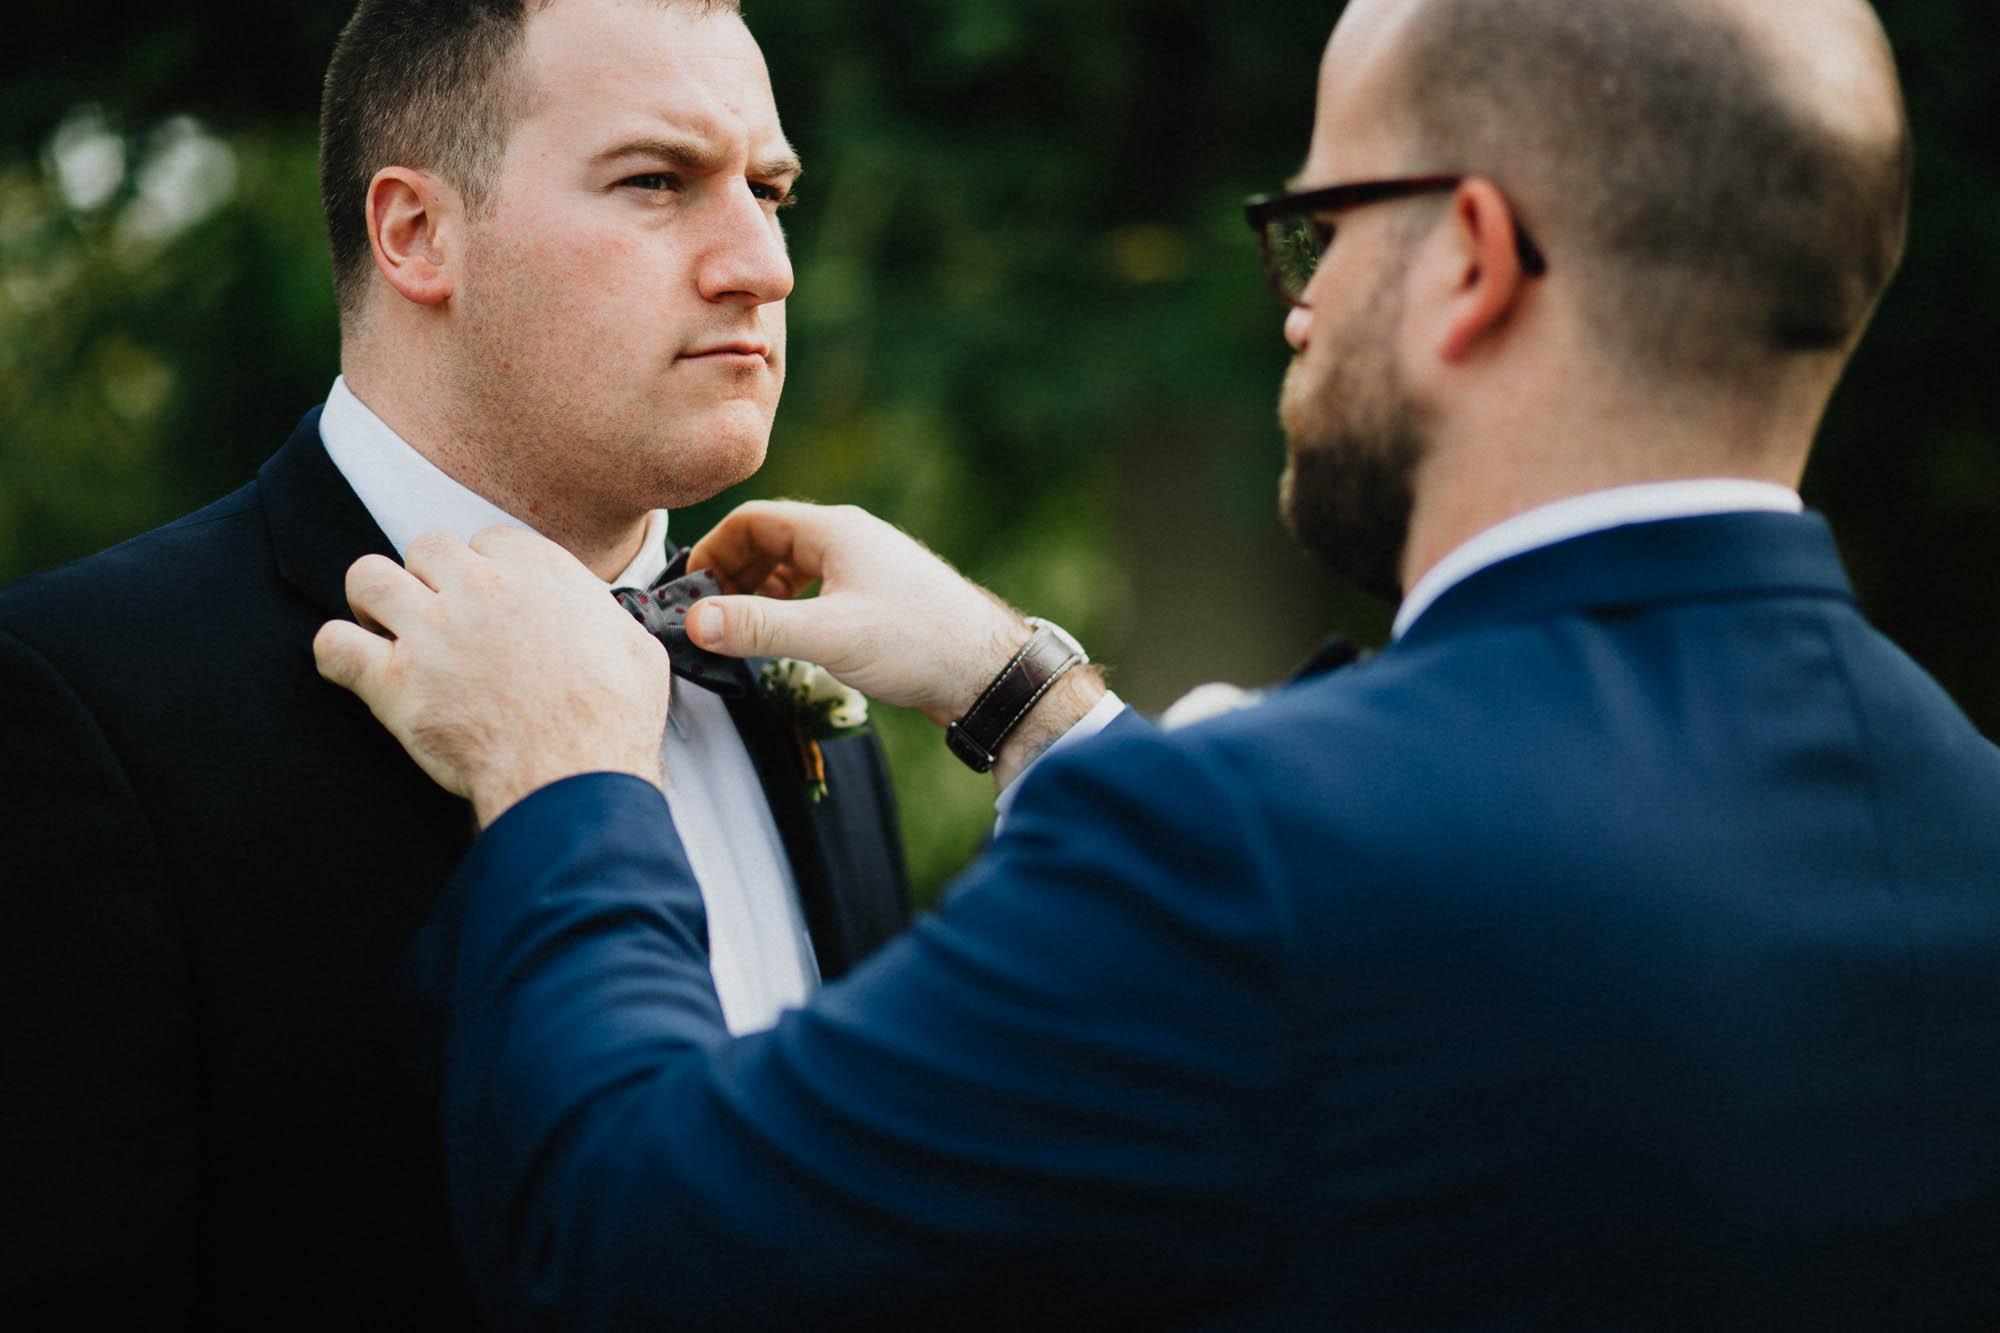 Highline-Car-House-Wedding-Columbus-Kristin-Aaron-034.jpg